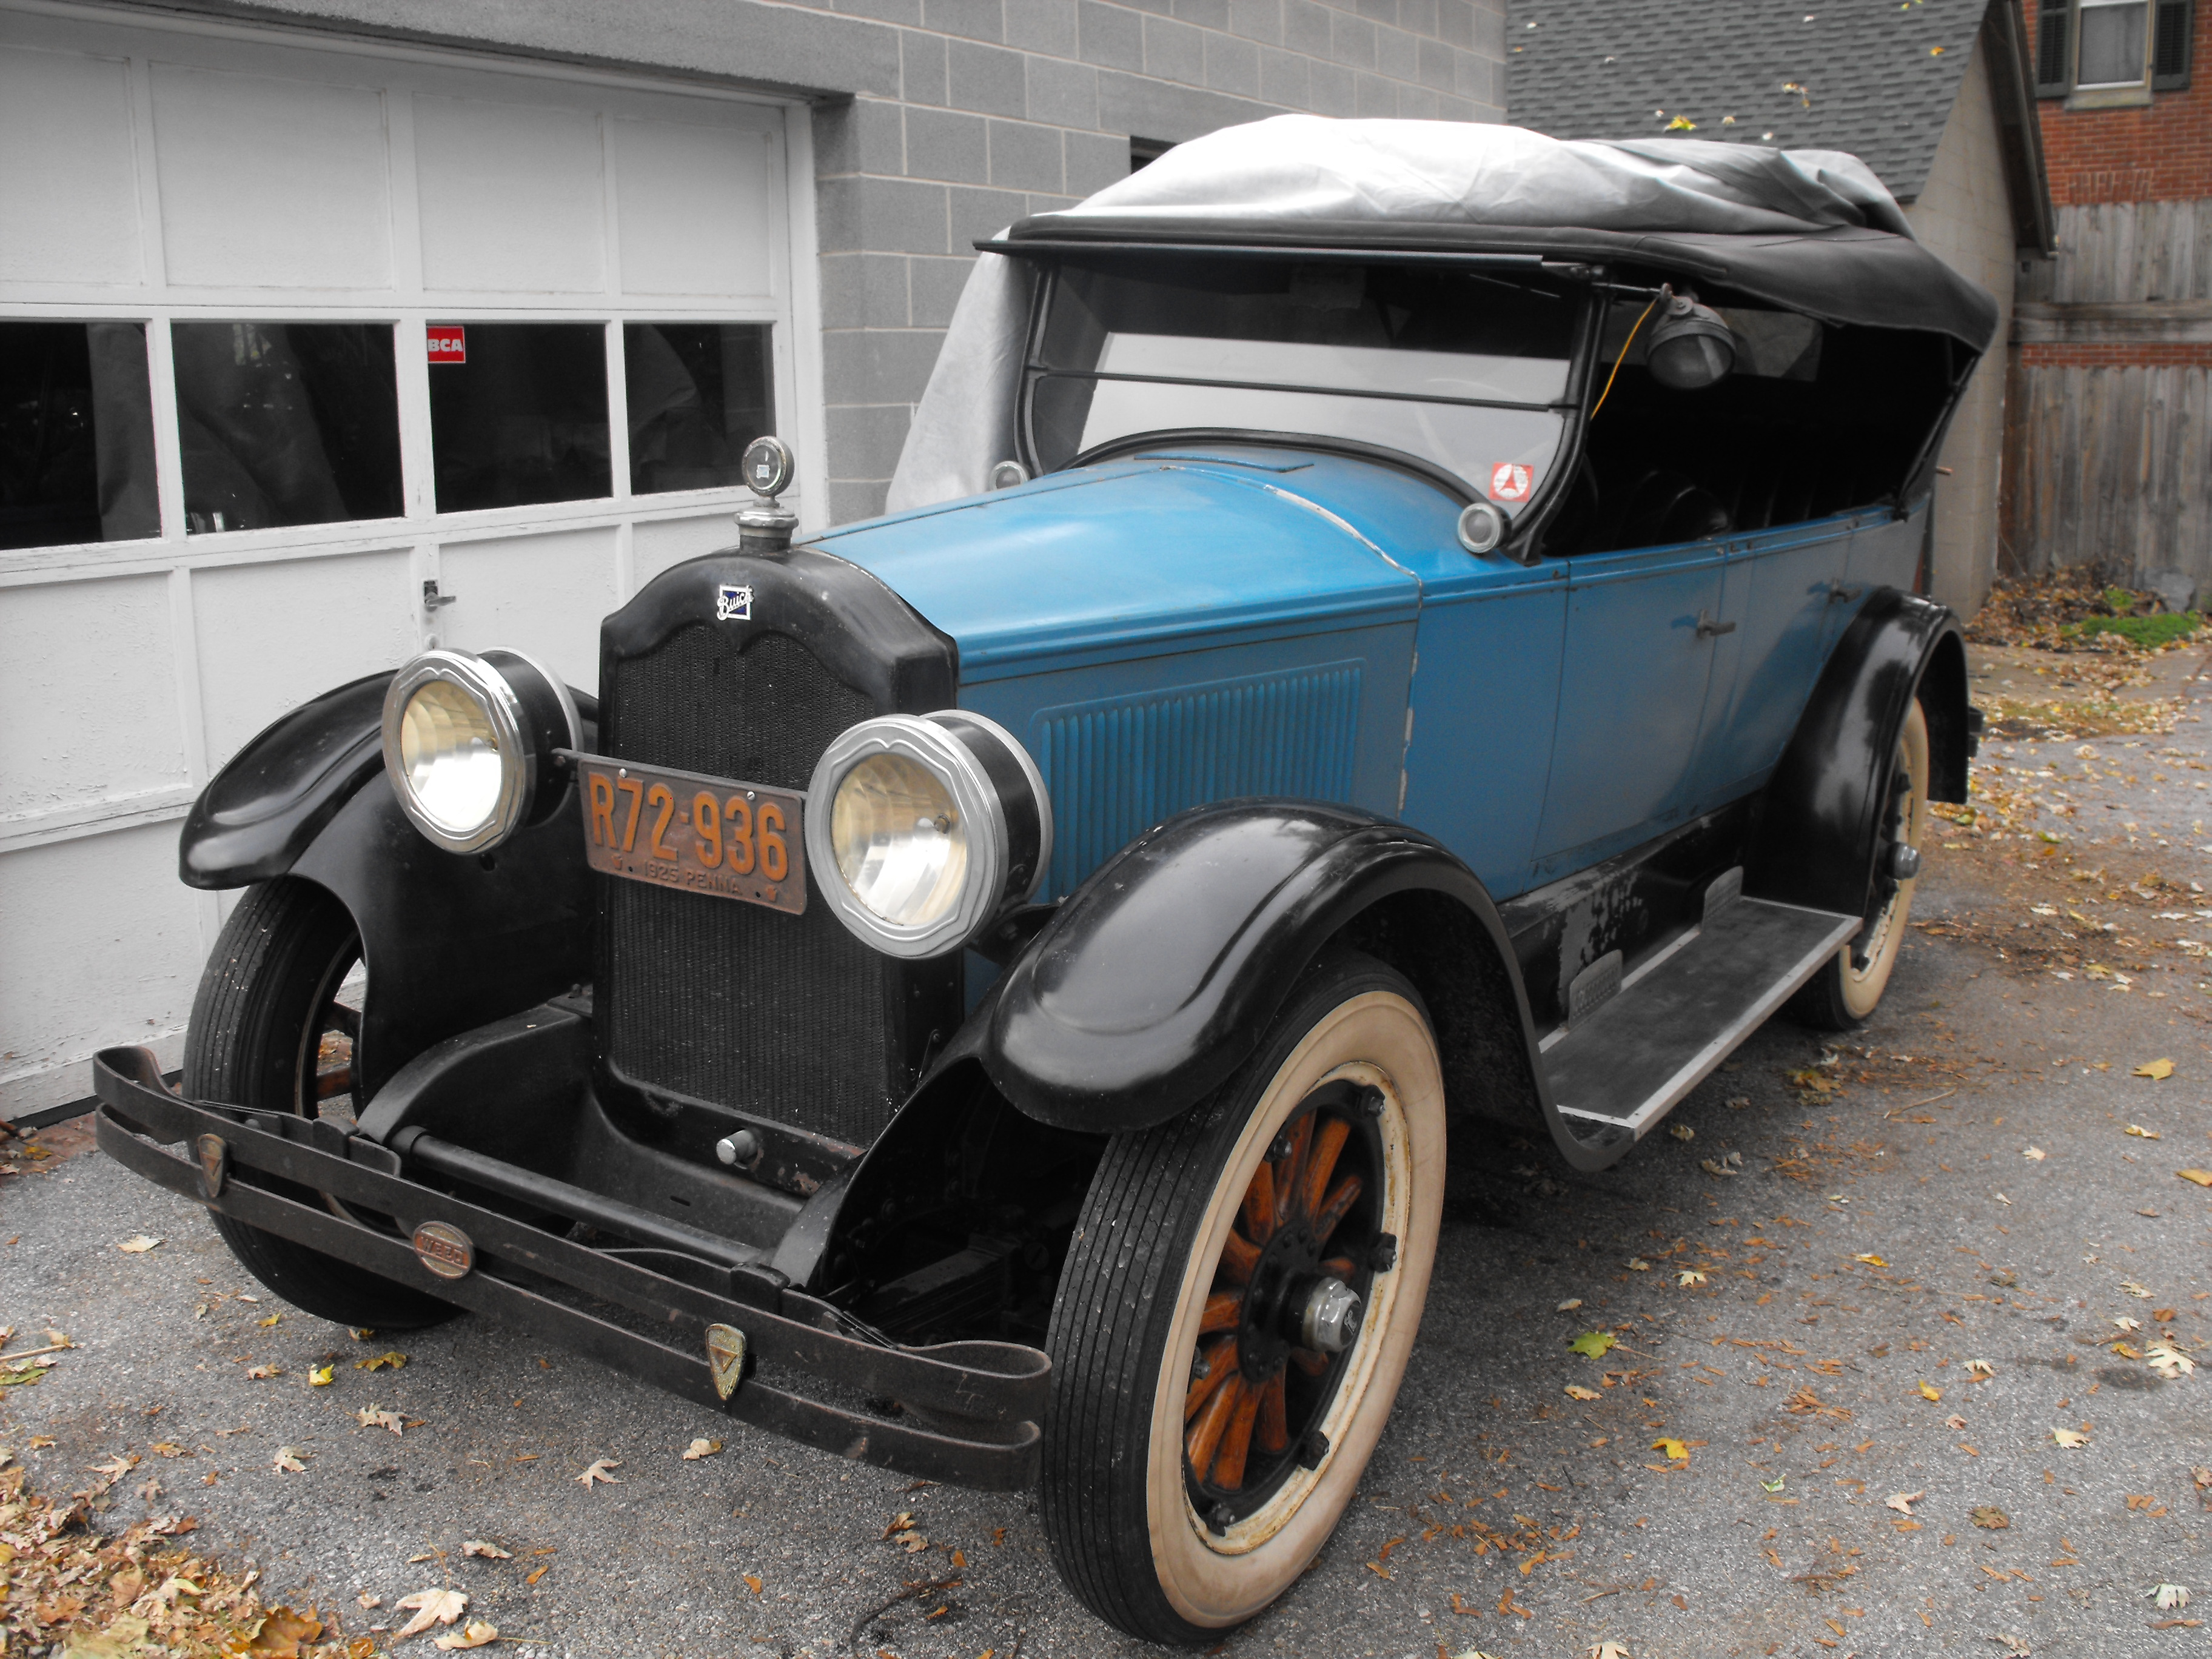 1923 Buick Roadster minneapolis craigslist - Buick - Buy/Sell ...